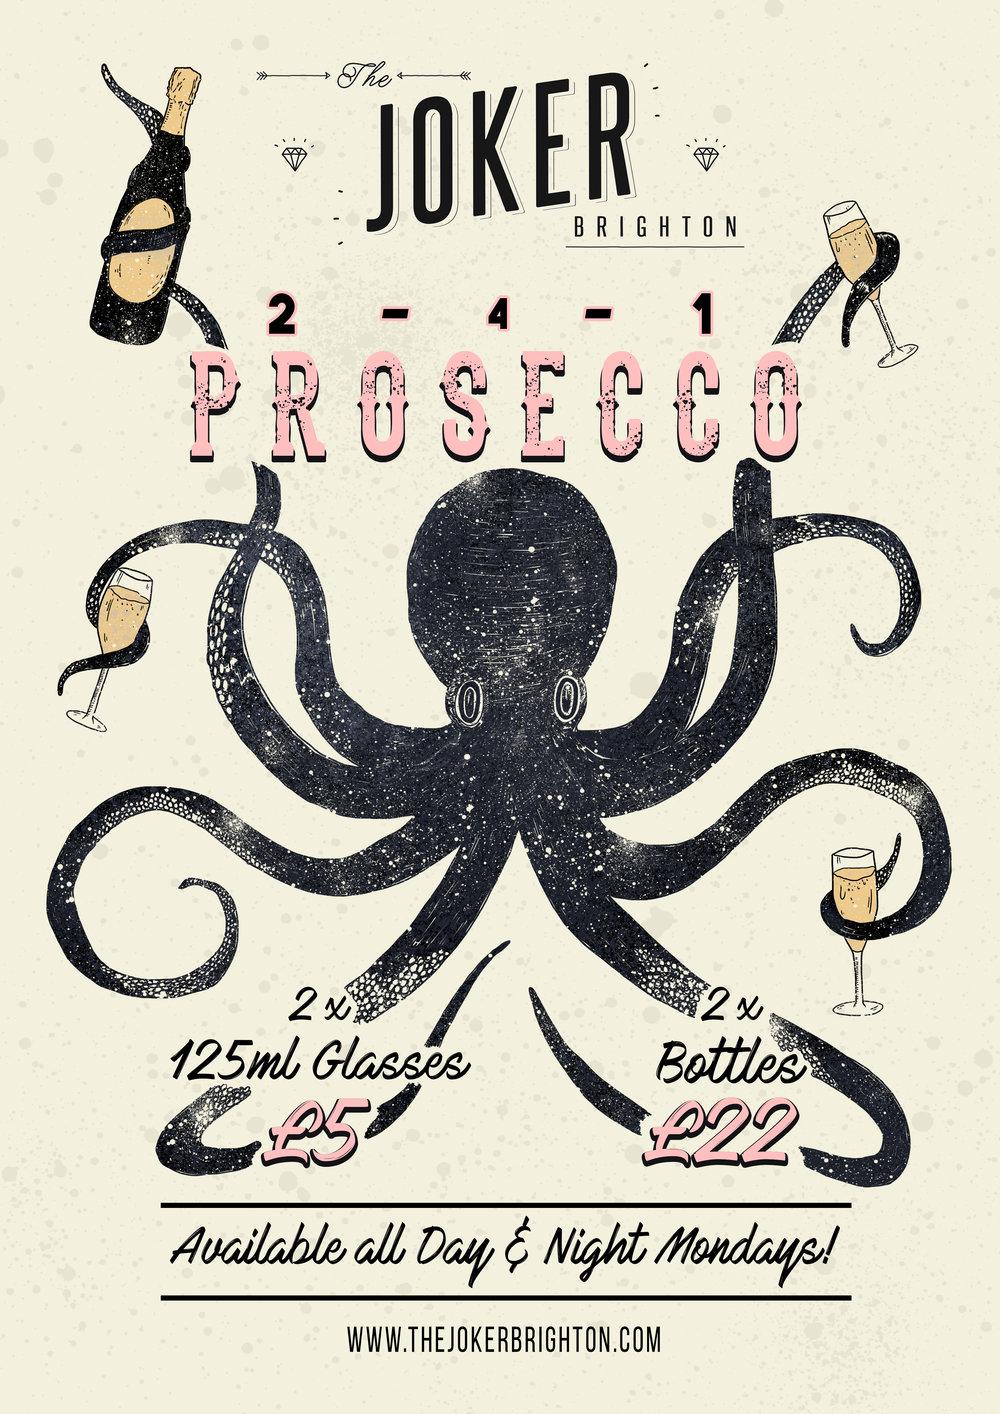 JOKER_PROSECCO.jpg